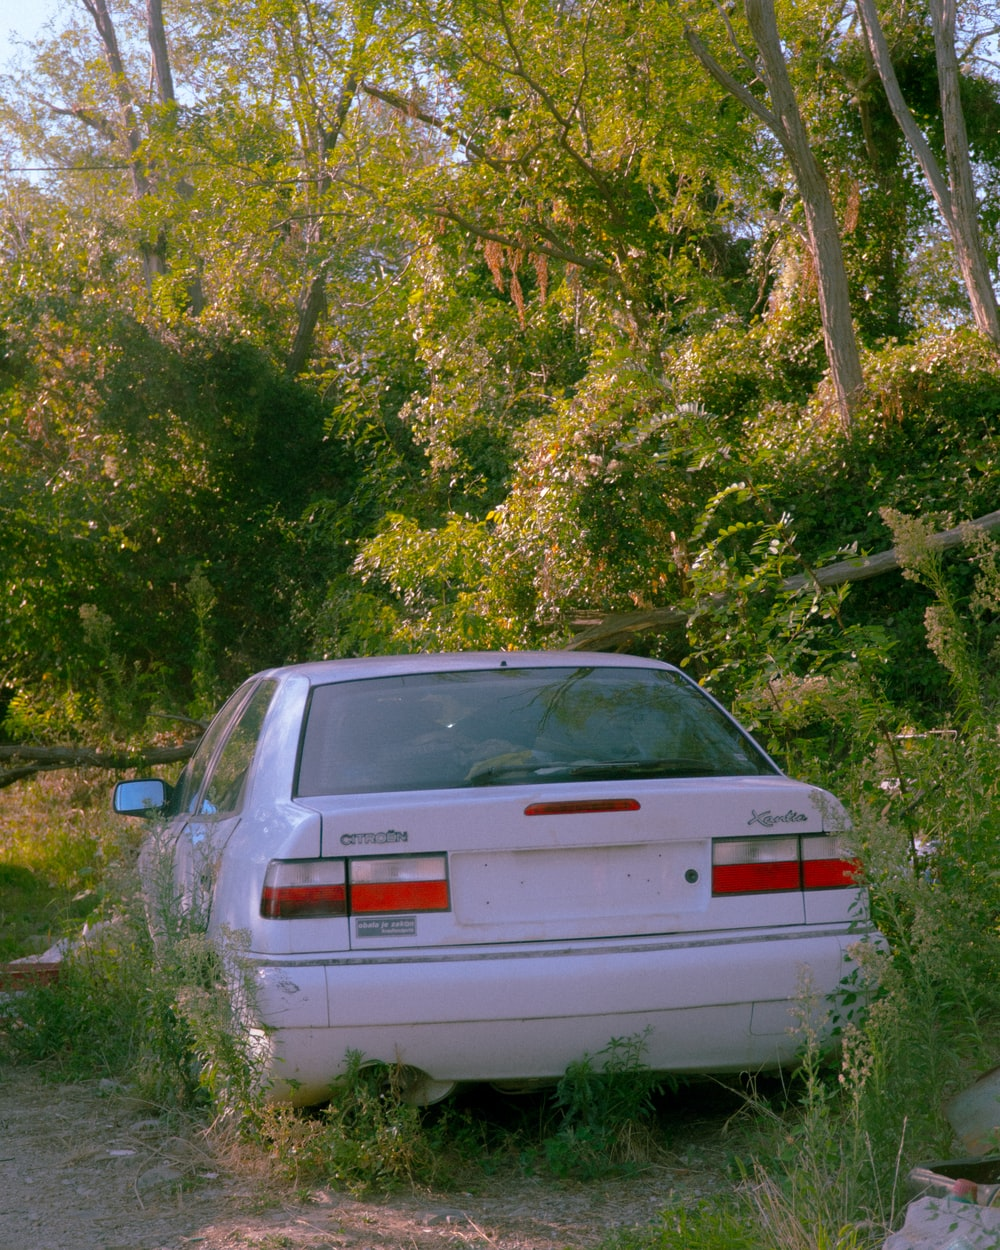 white chevrolet car parked near green trees during daytime